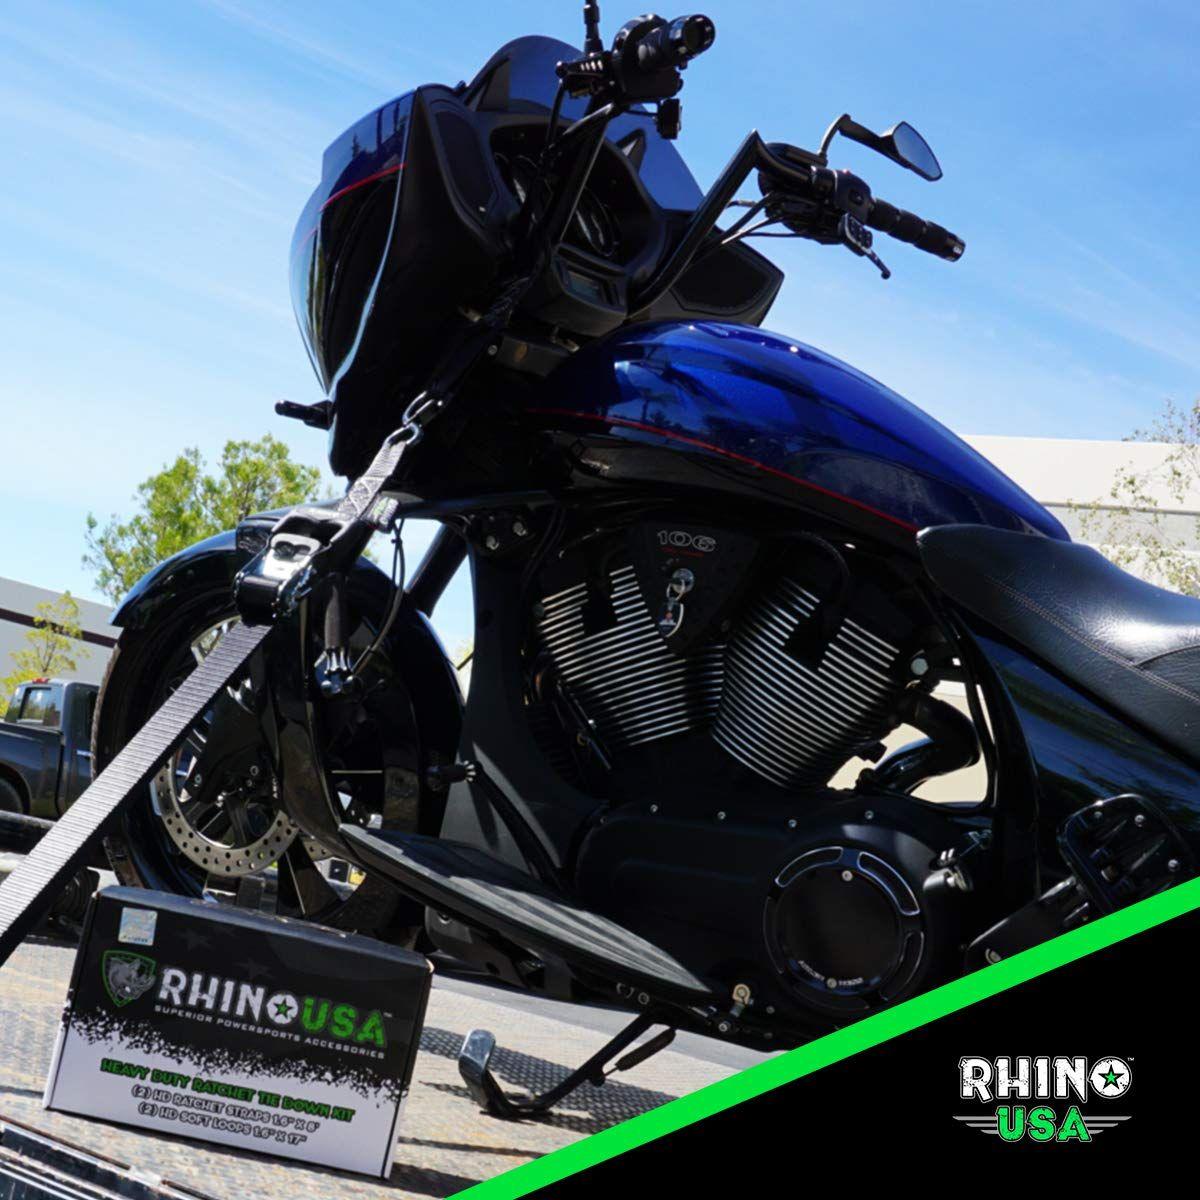 RHINO USA Ratchet Straps Motorcycle Tie Down Kit, 5,208